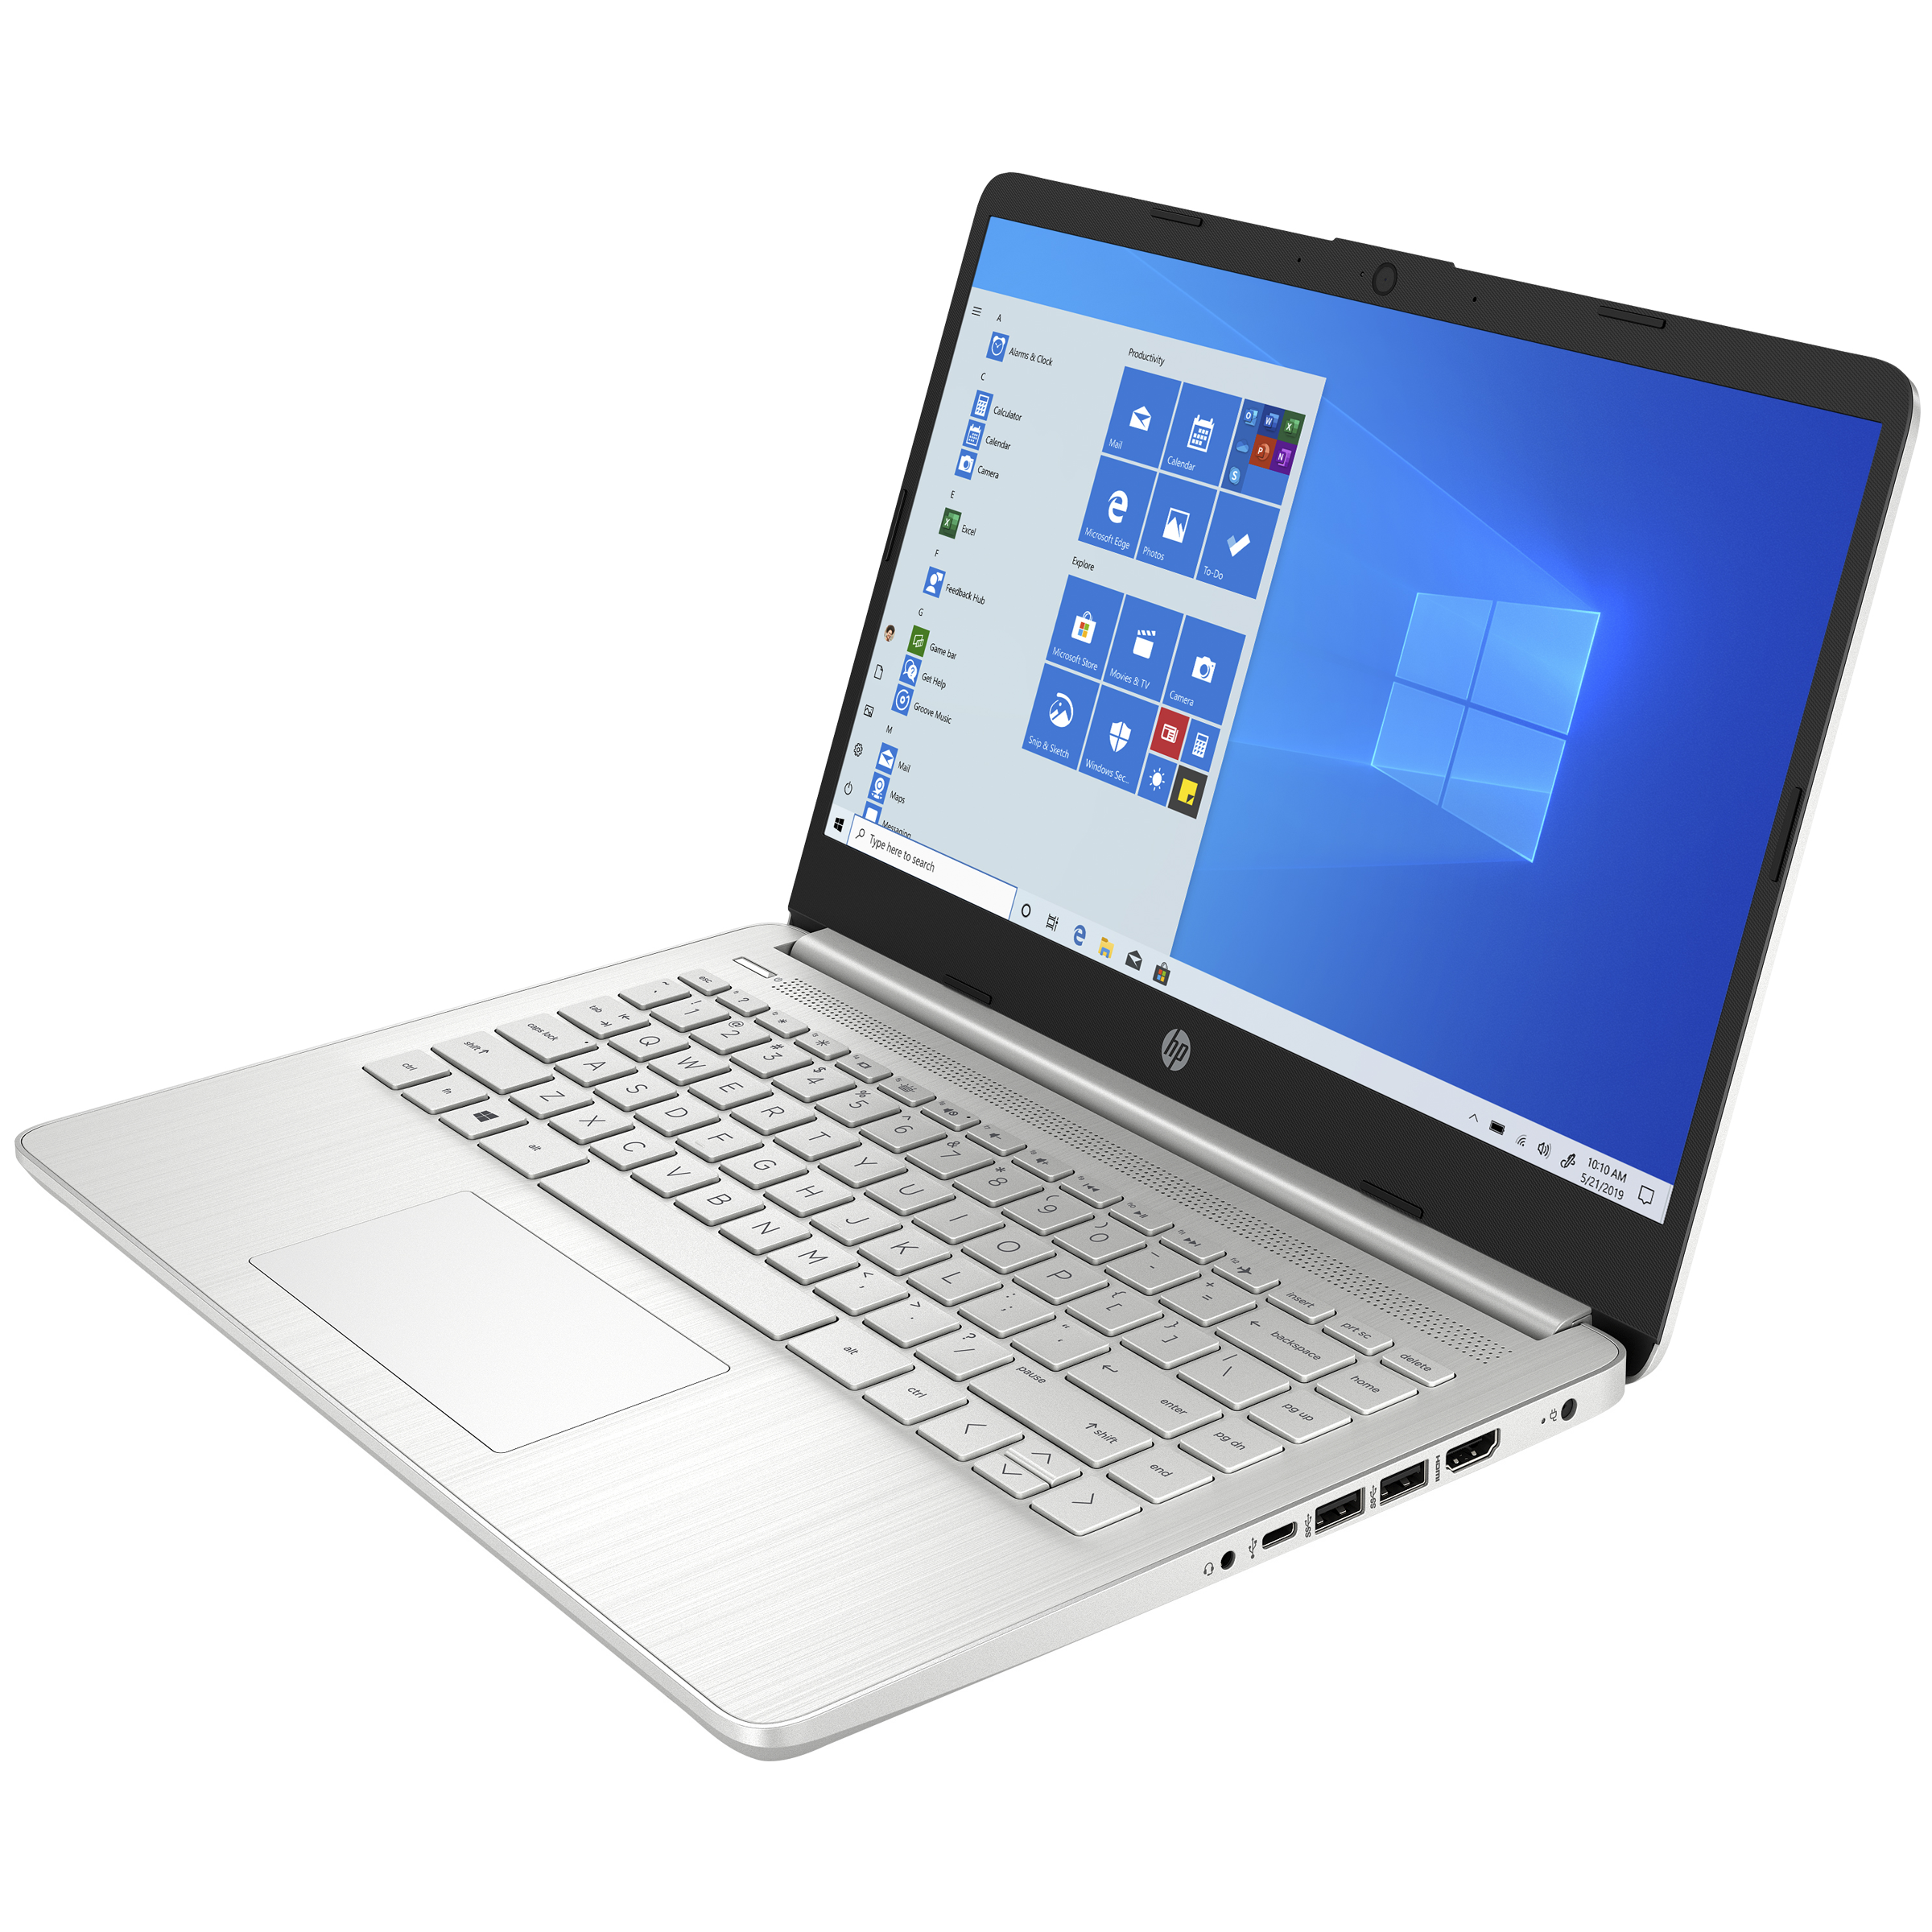 HP 14s-dq2101TU (38Z17PA#ACJ) Core i3 11th Gen Windows 10 Home Laptop (8GB RAM, 256GB SSD, Intel UHD Graphics, MS Office, 35.56cm, Natural Silver)_3